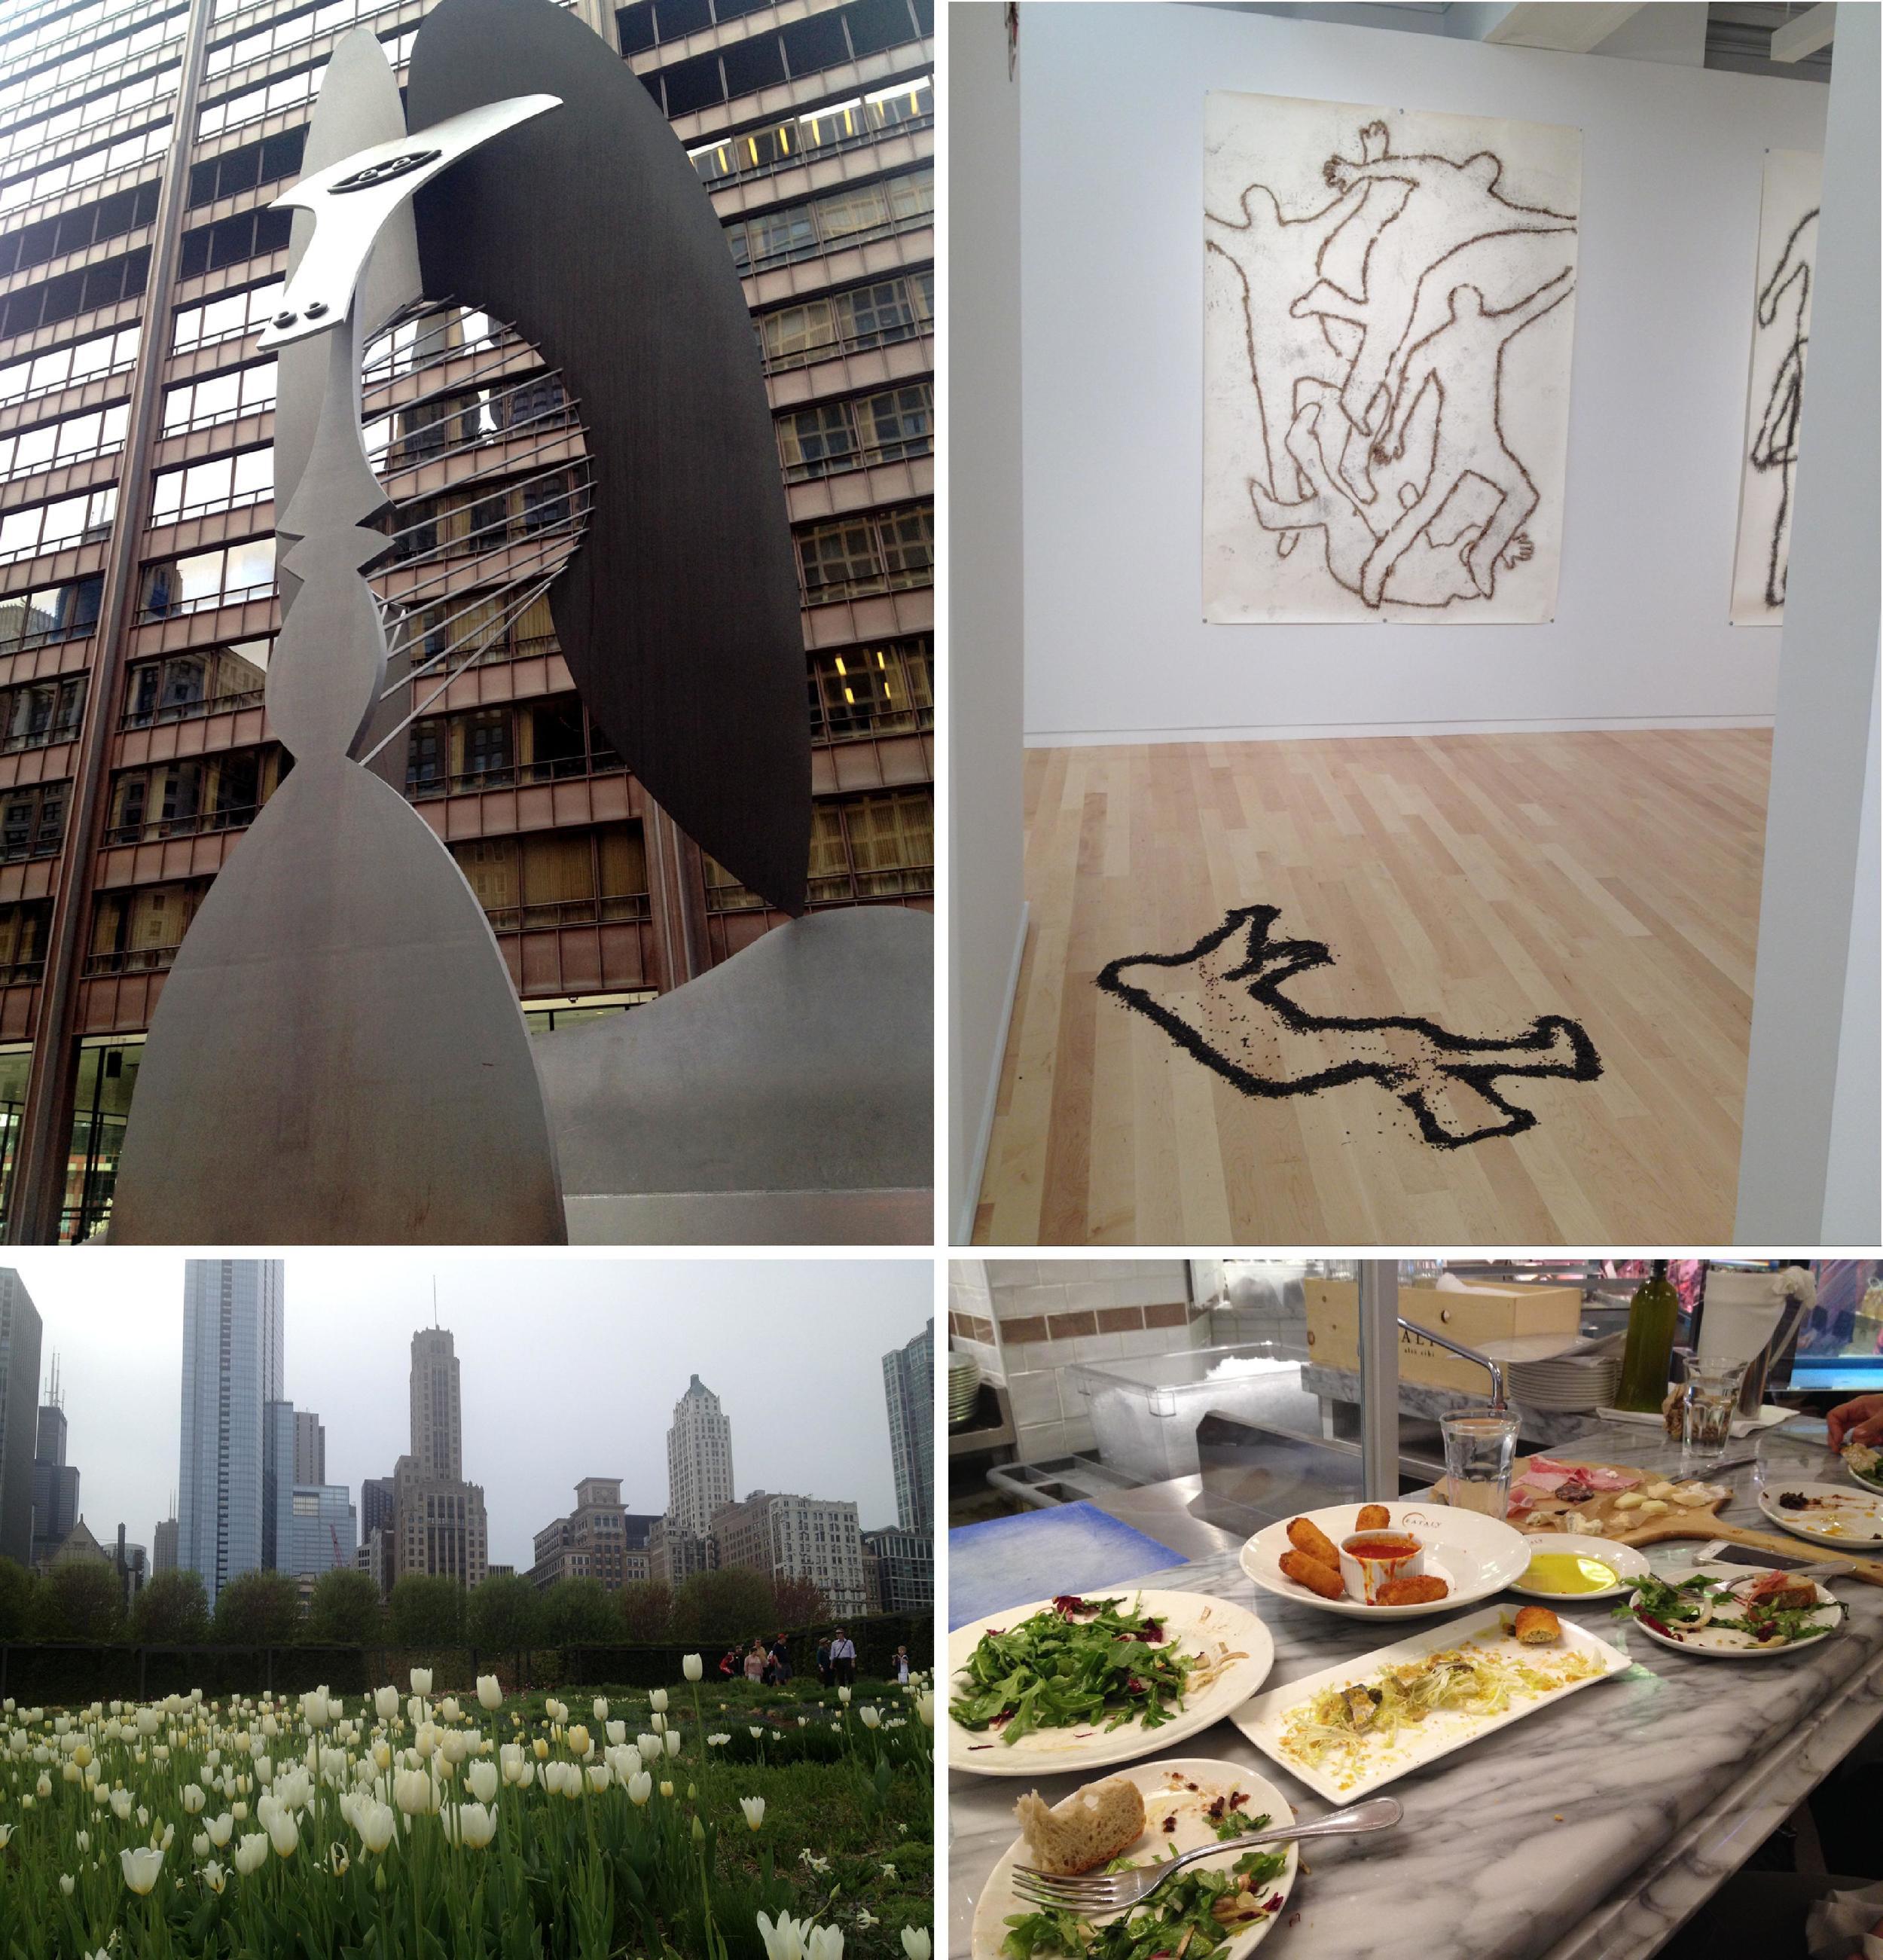 Chicago • Picasso,Miller & Shellabarger, EATaly, Millennium Park